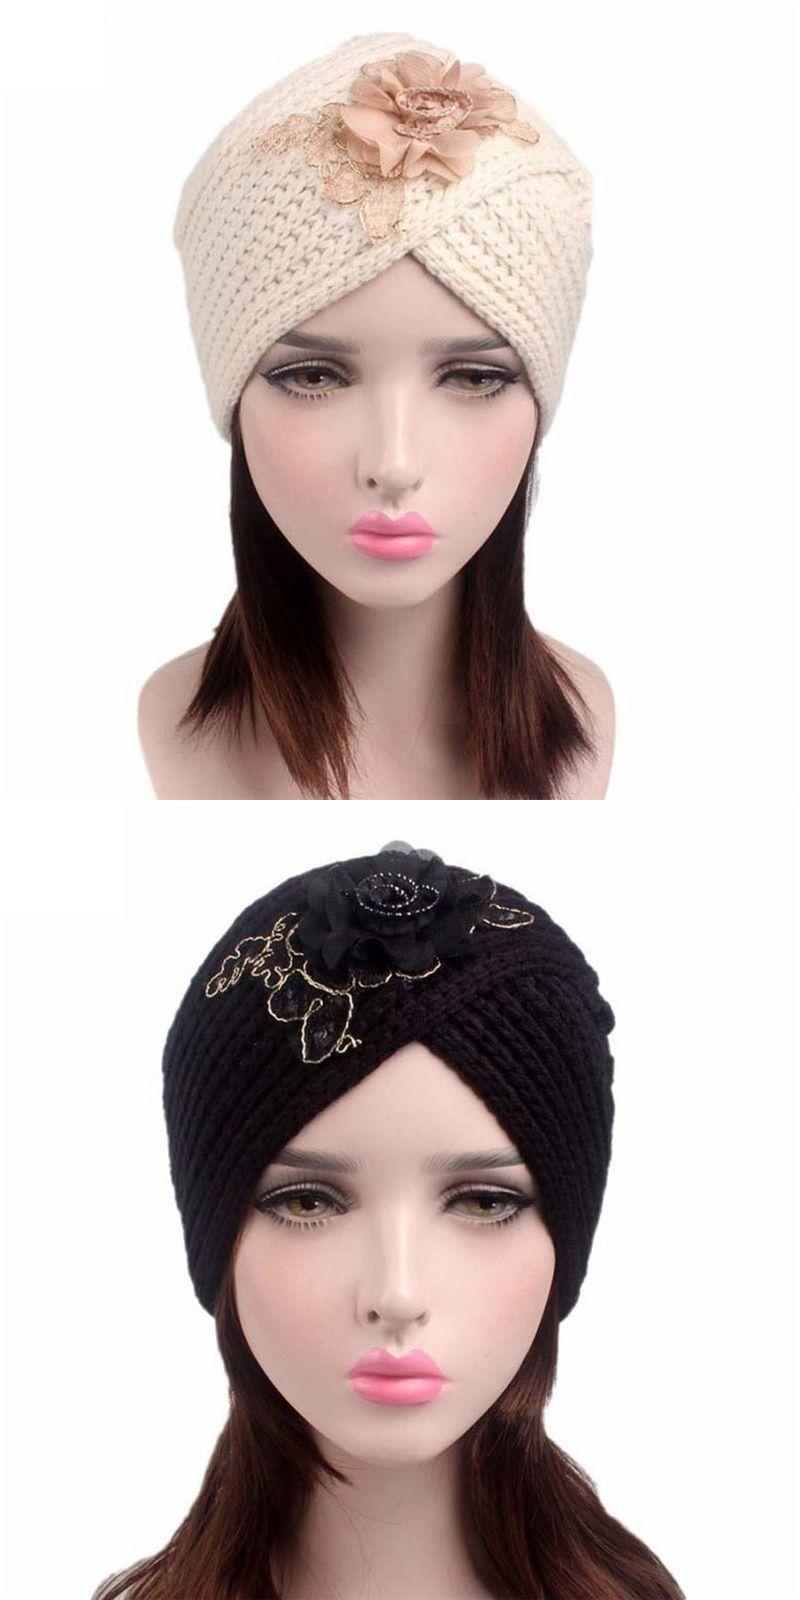 858a9317dca Women flower skullies beanies ladies retro winter knitting acrylic wool hat  turban brim hat cap pile